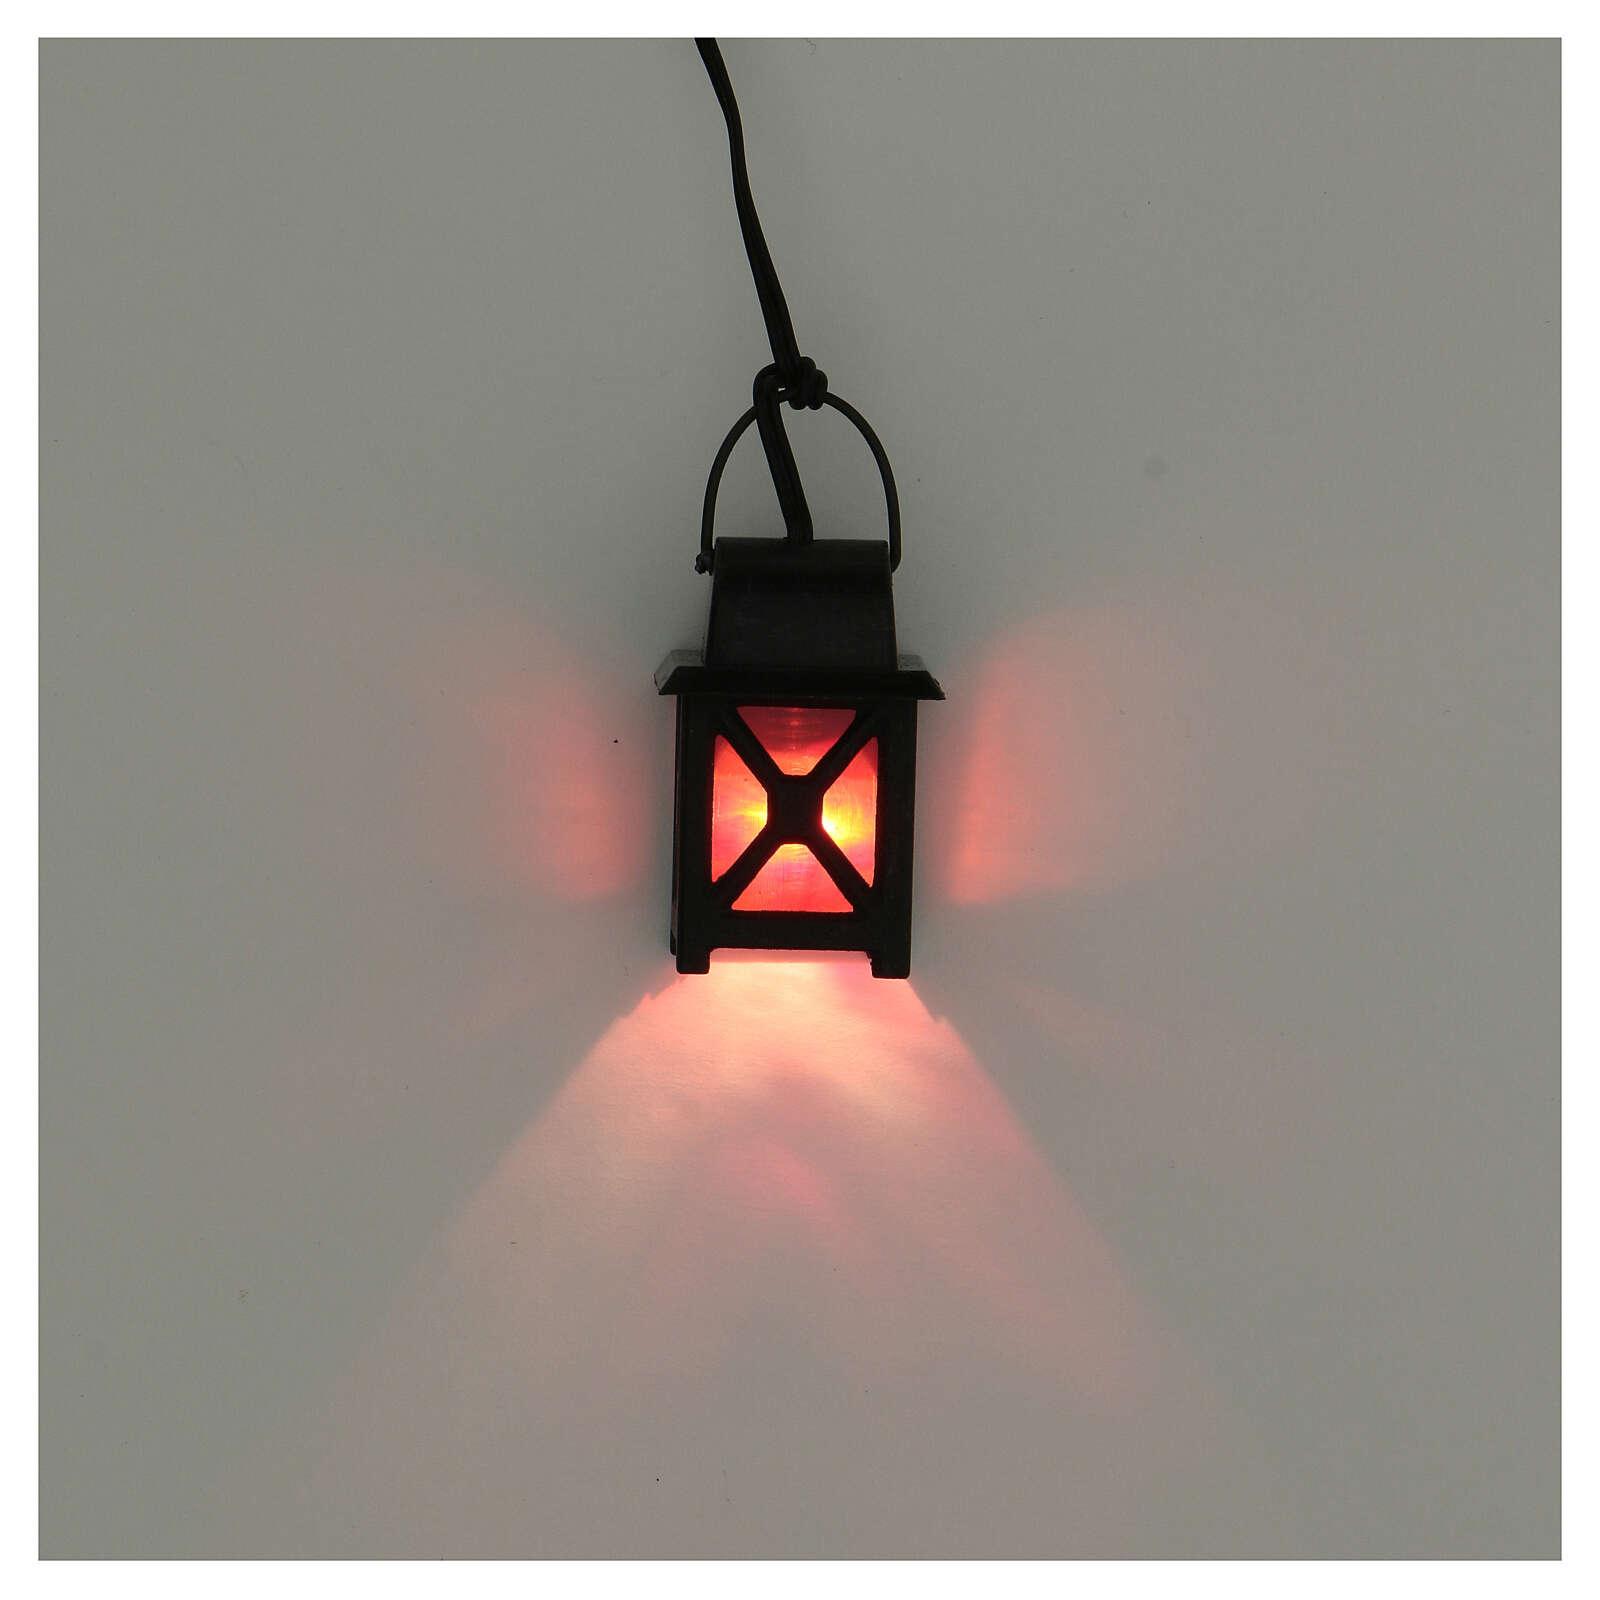 Lanterna bassa tensione luce rossa presepe 8-10 cm 4